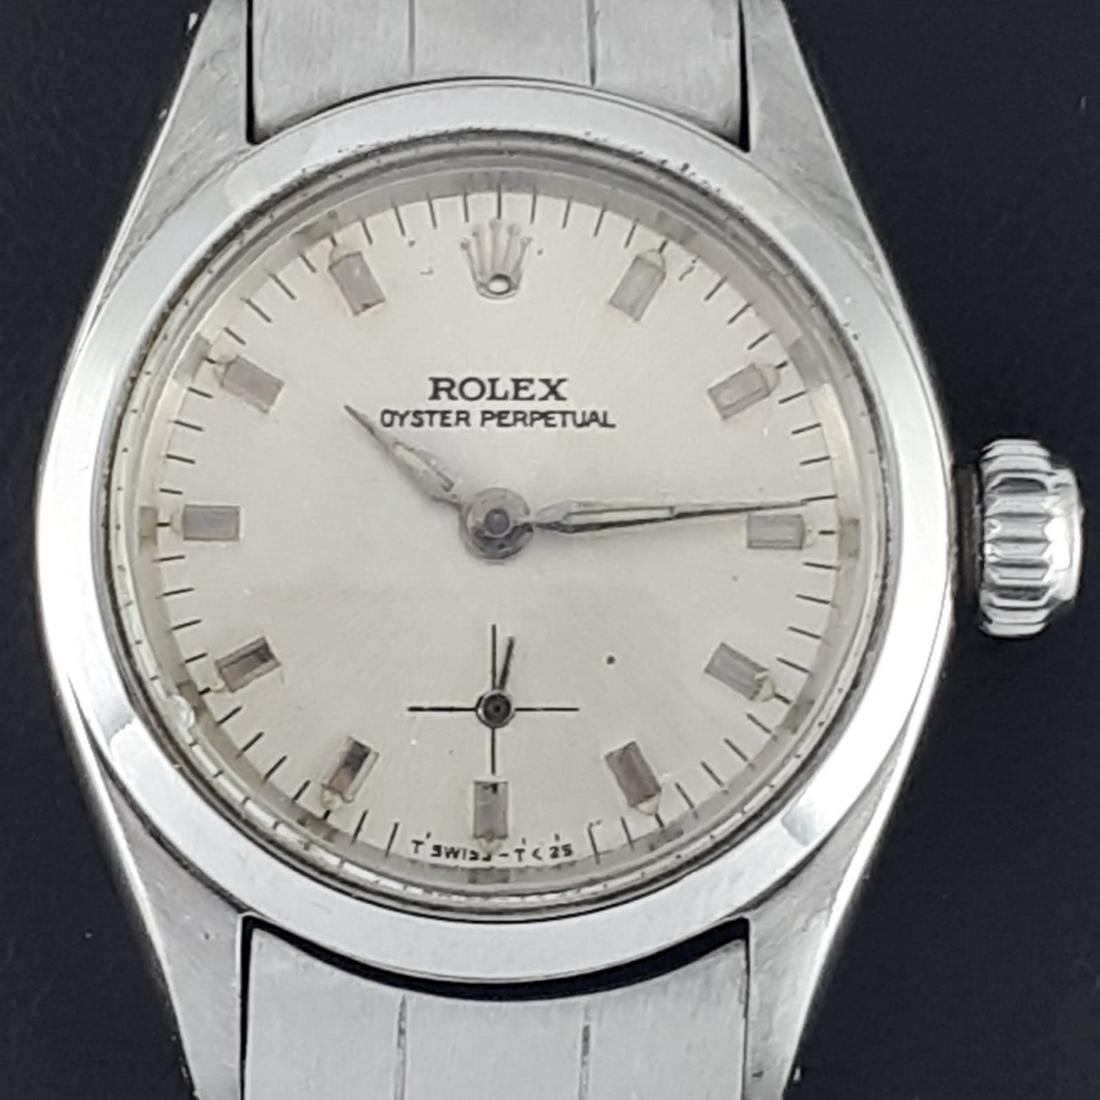 Rolex - Oyster Perpetual - Ref: 6503 - Women -